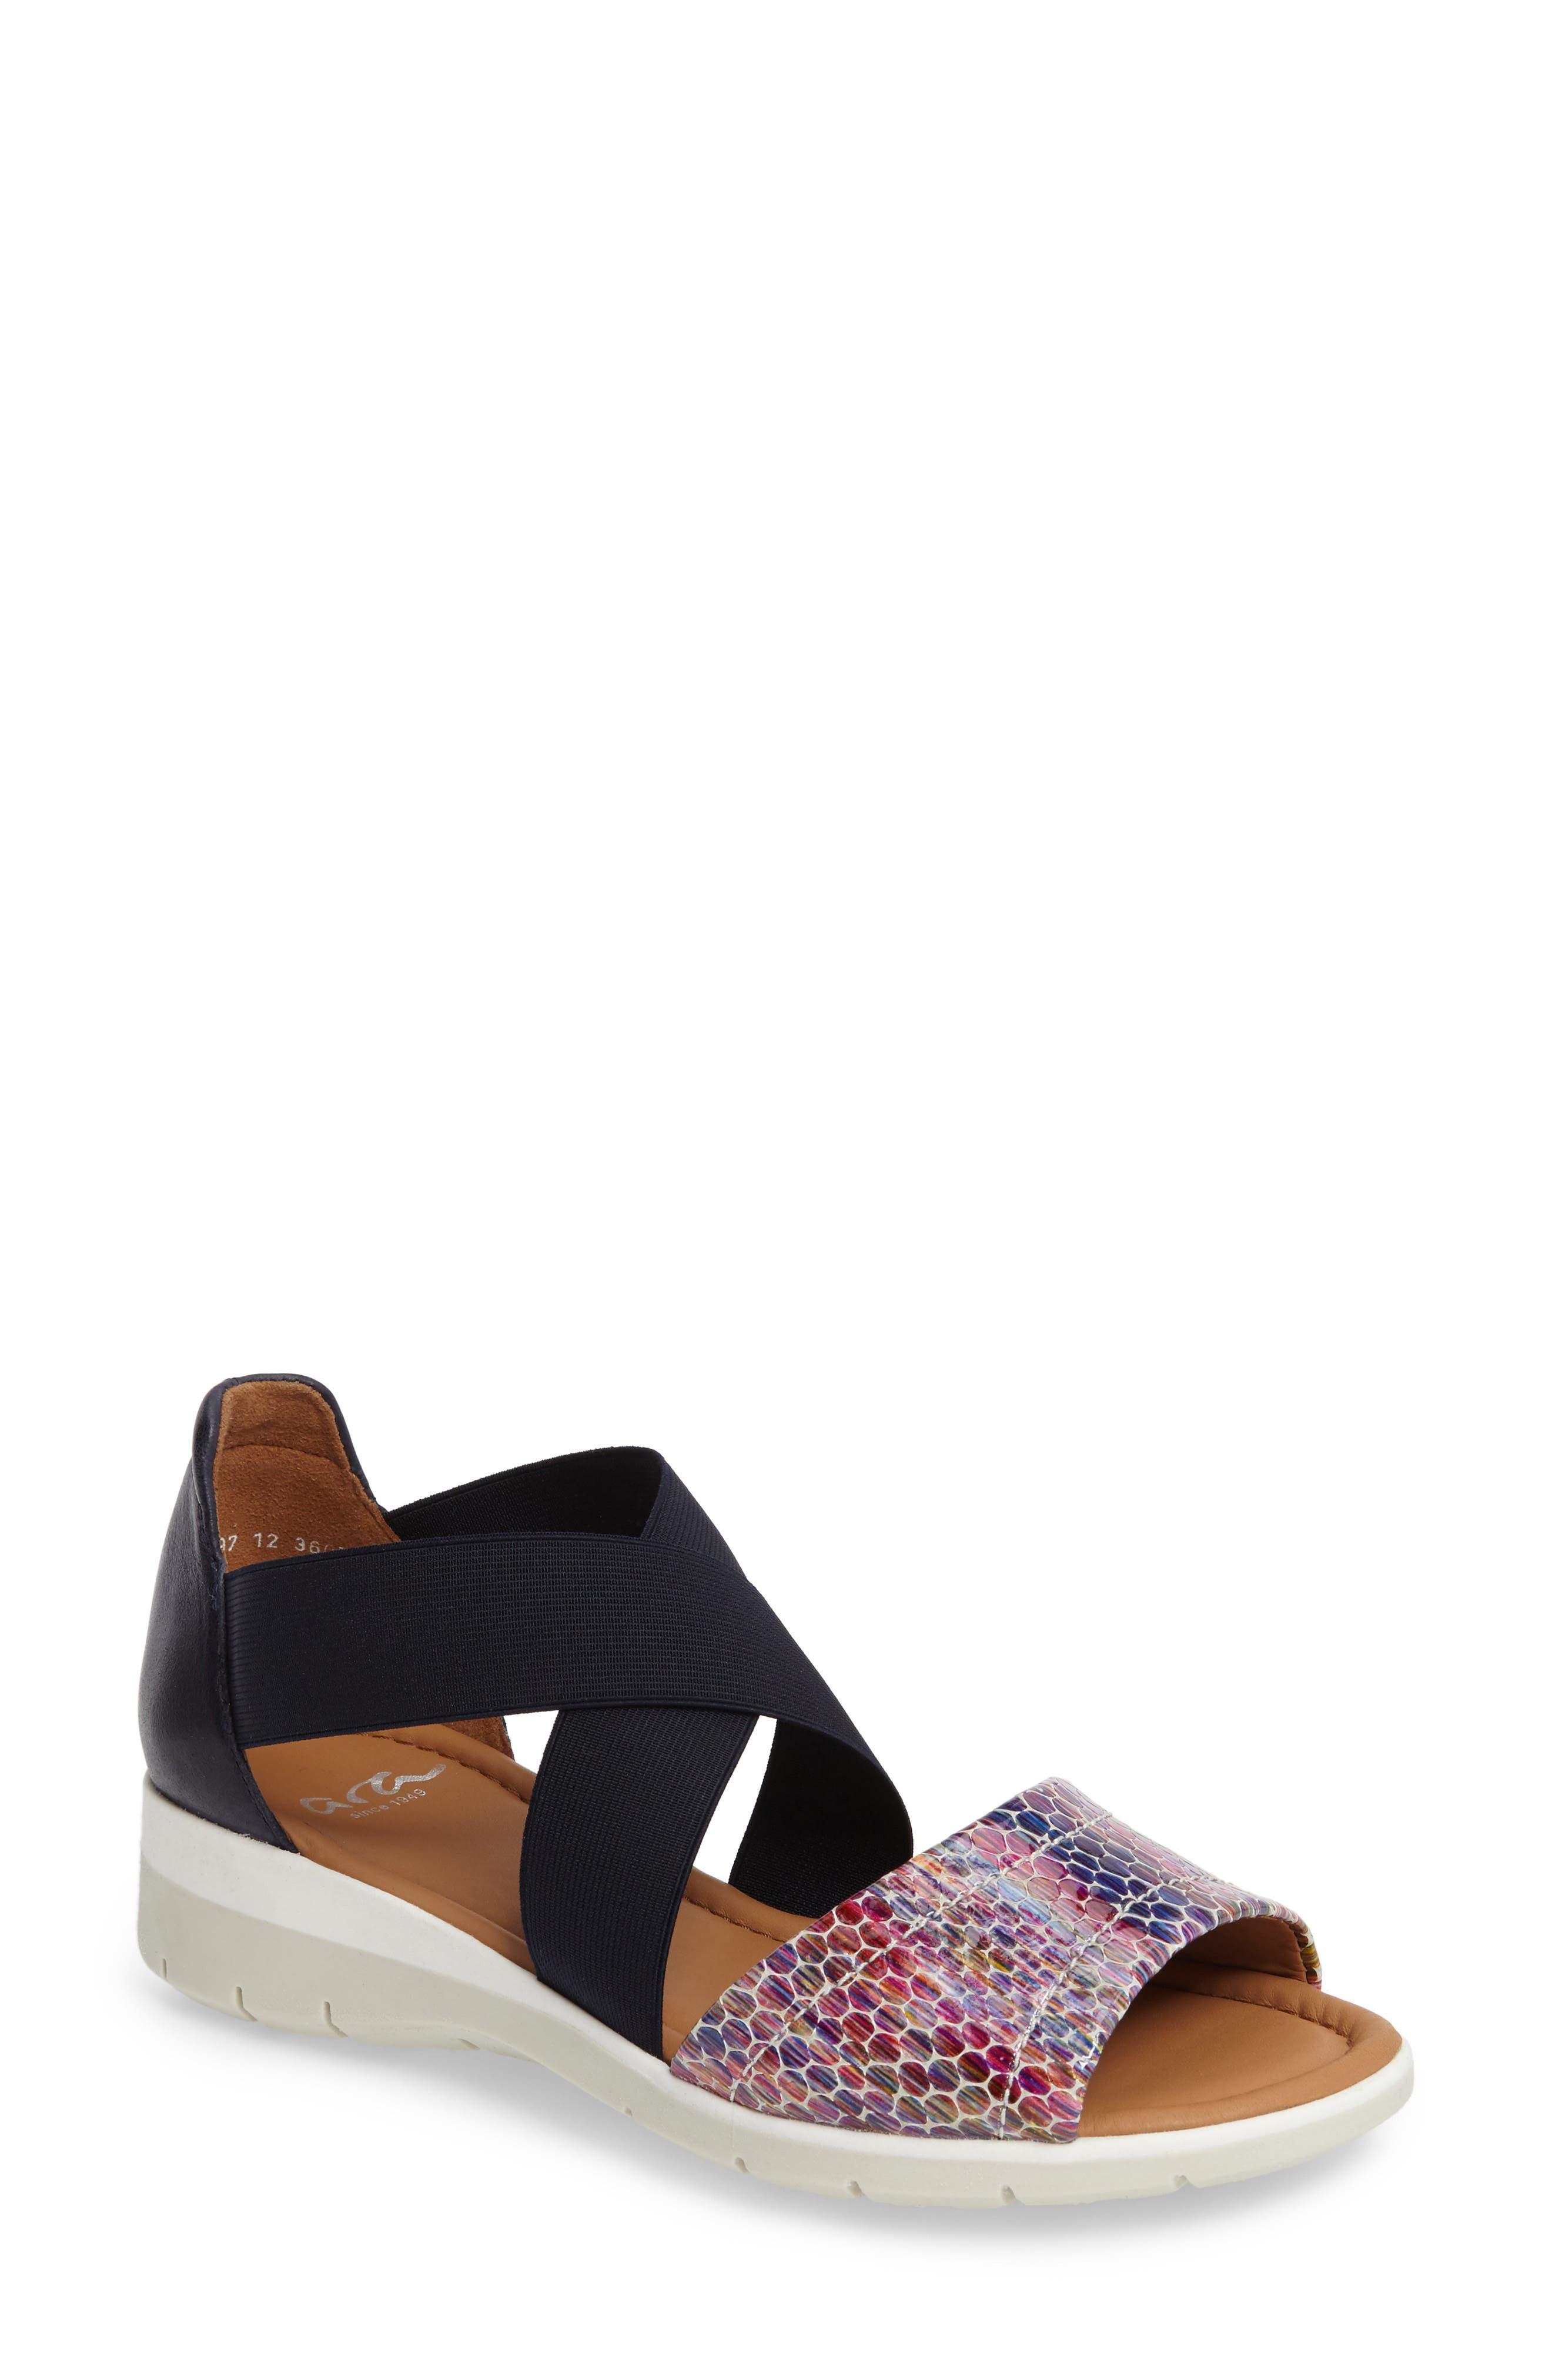 Larissa Cross Strap Wedge Sandal,                             Main thumbnail 1, color,                             BLACK MULTI LEATHER